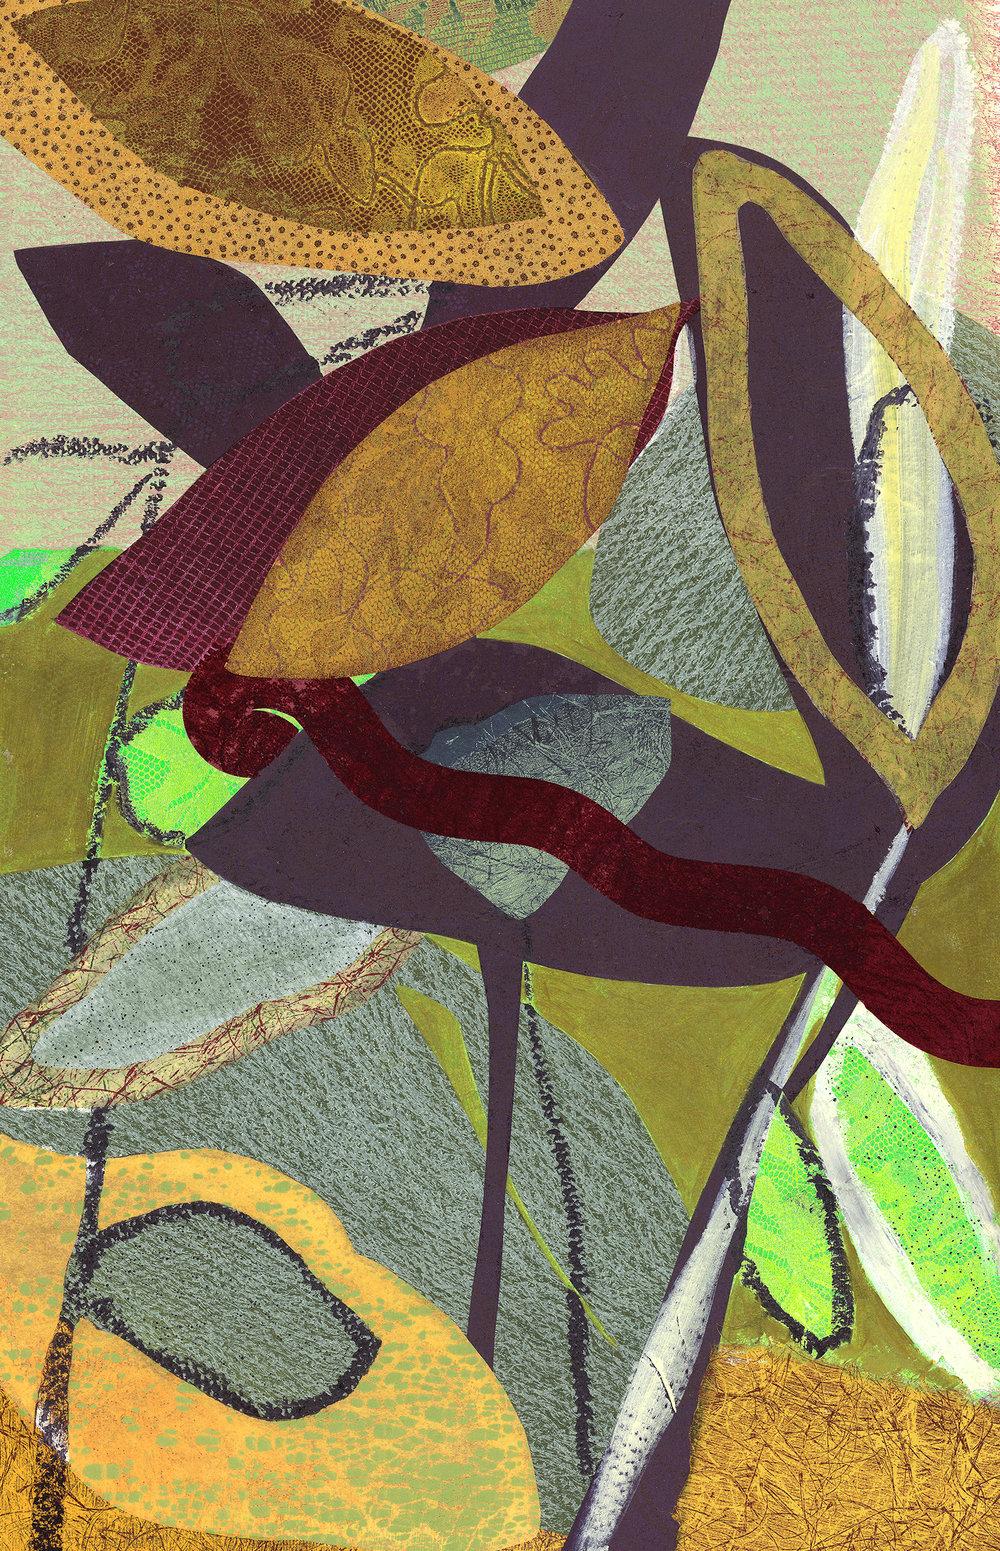 """Pods"", monoprints, collage, oil stick, 25.5"" x 19.5"", $700 (framed)"